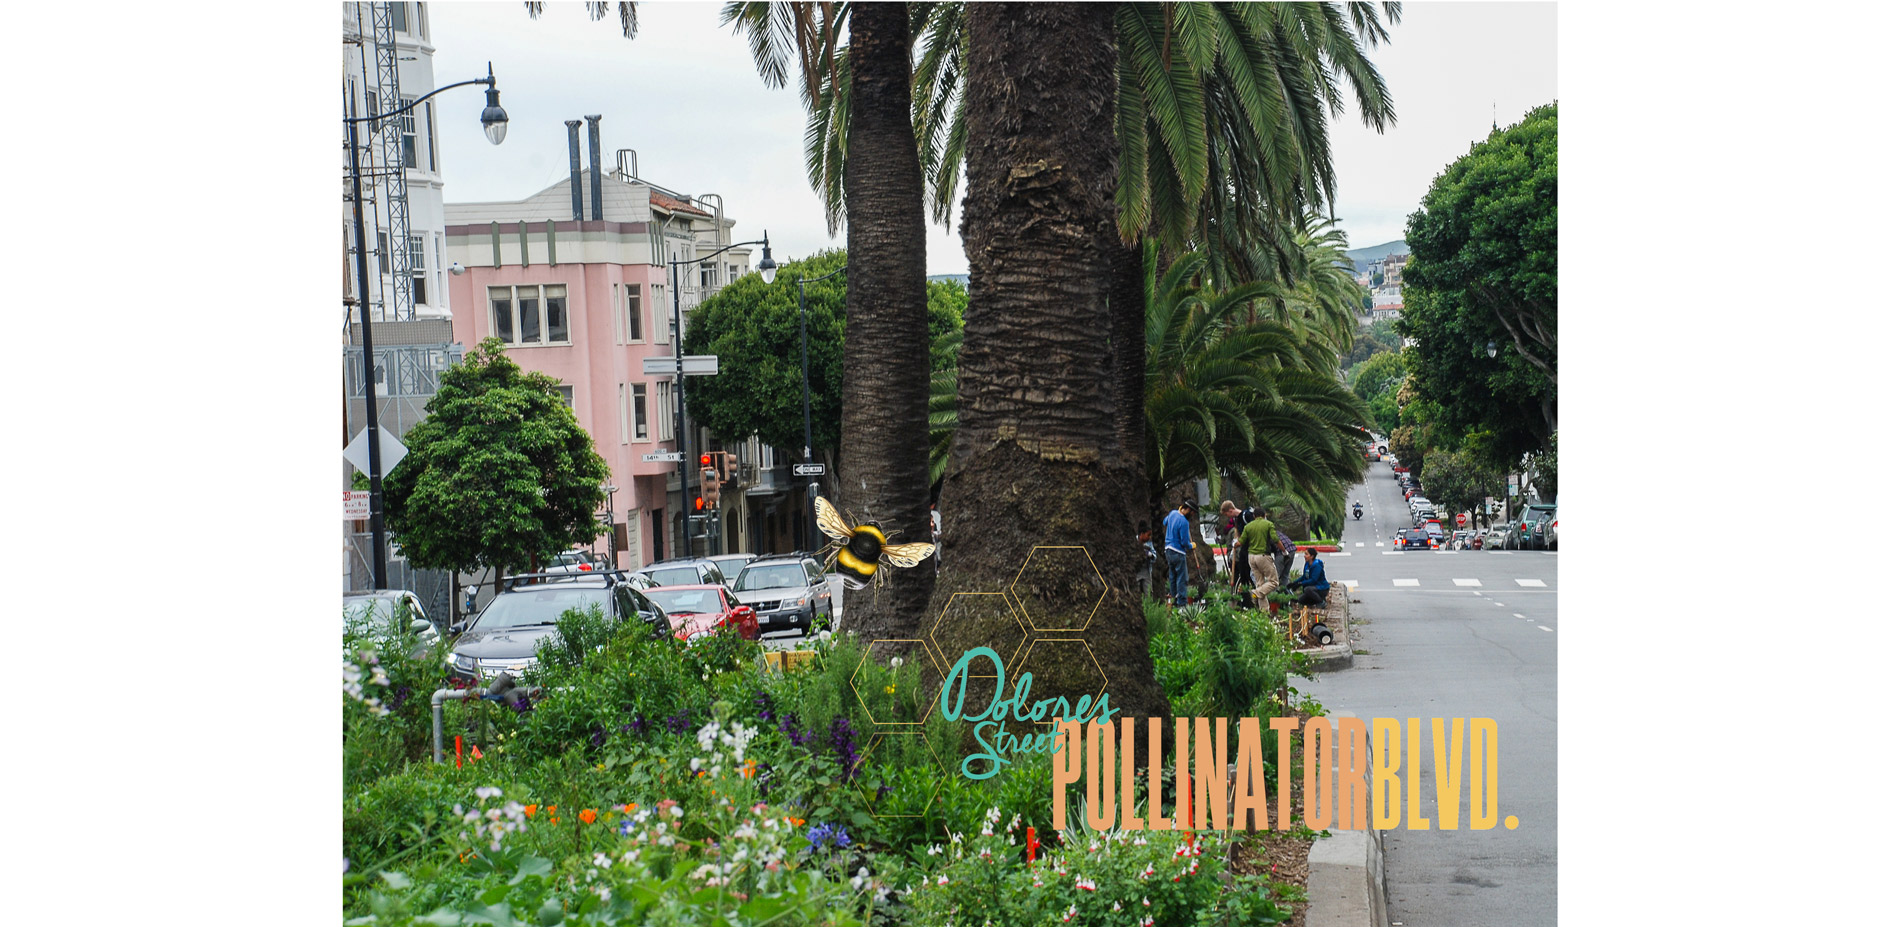 Dolores Street Pollinator Boulevard | 2018 ASLA Student Awards